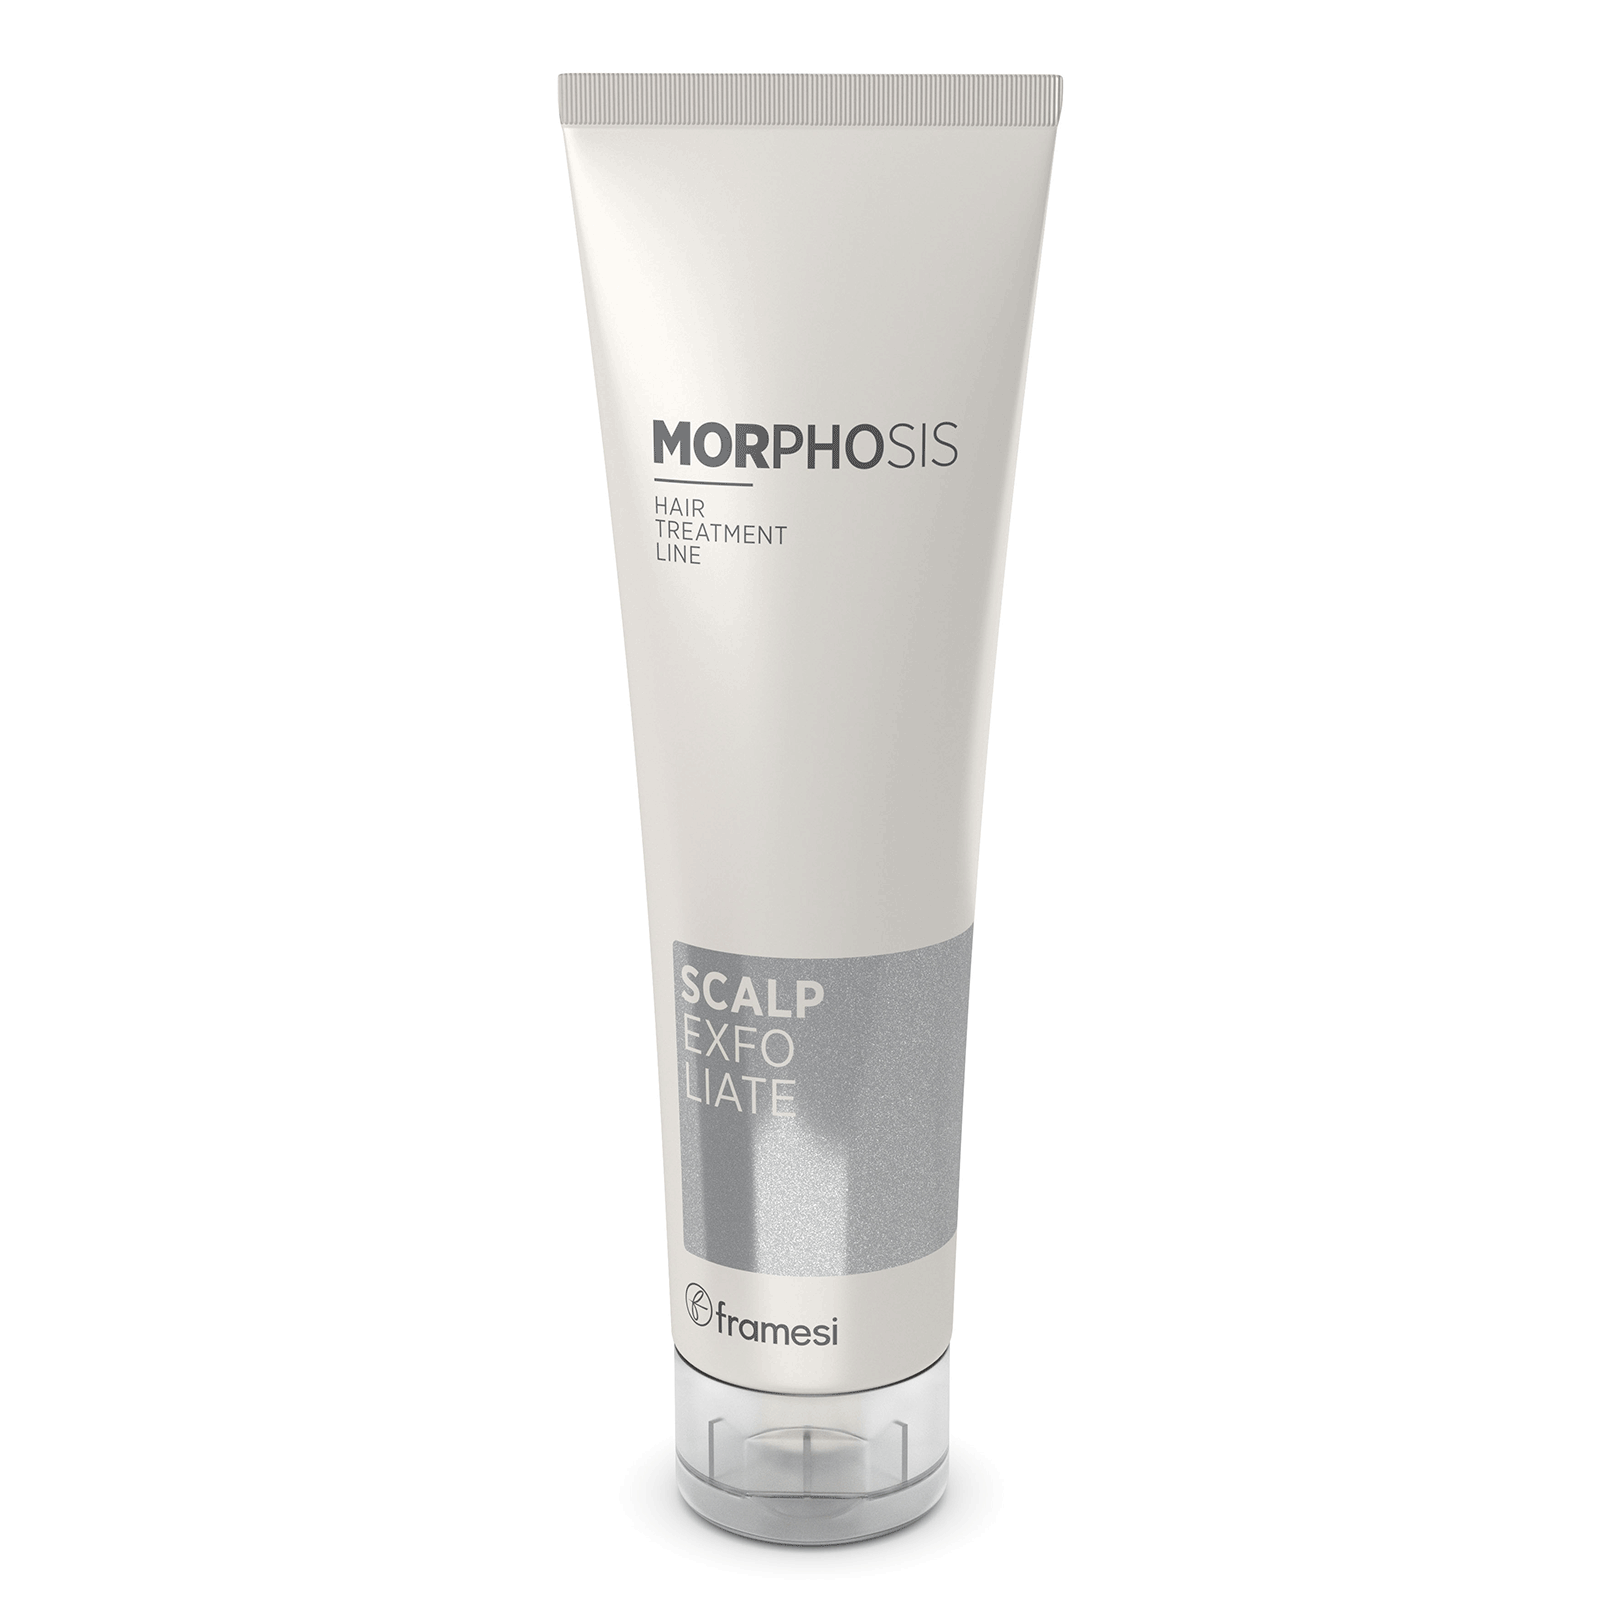 Morphosis Scalp Exfoliate - Framesi | CosmoProf